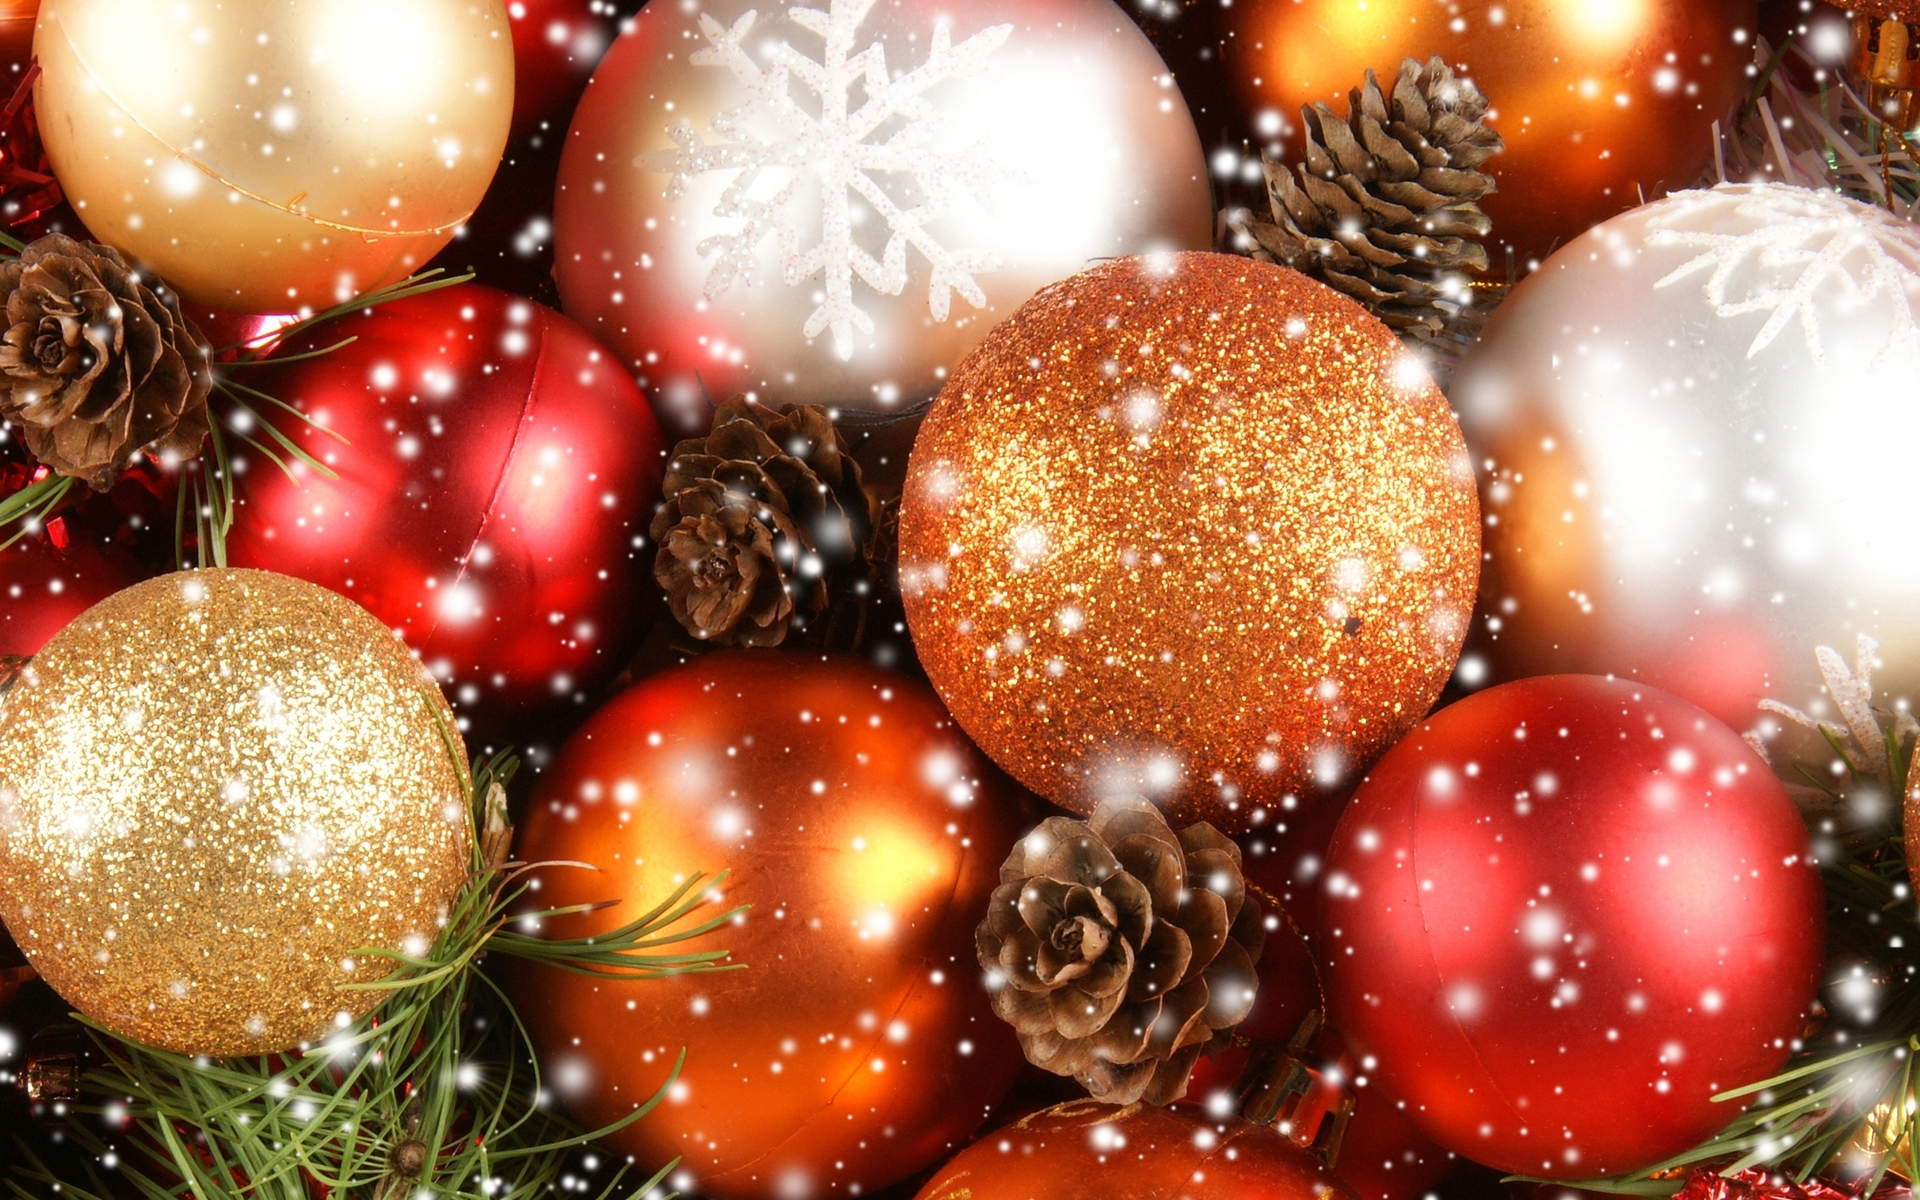 christmas ornaments wallpaper 8026 - photo #1